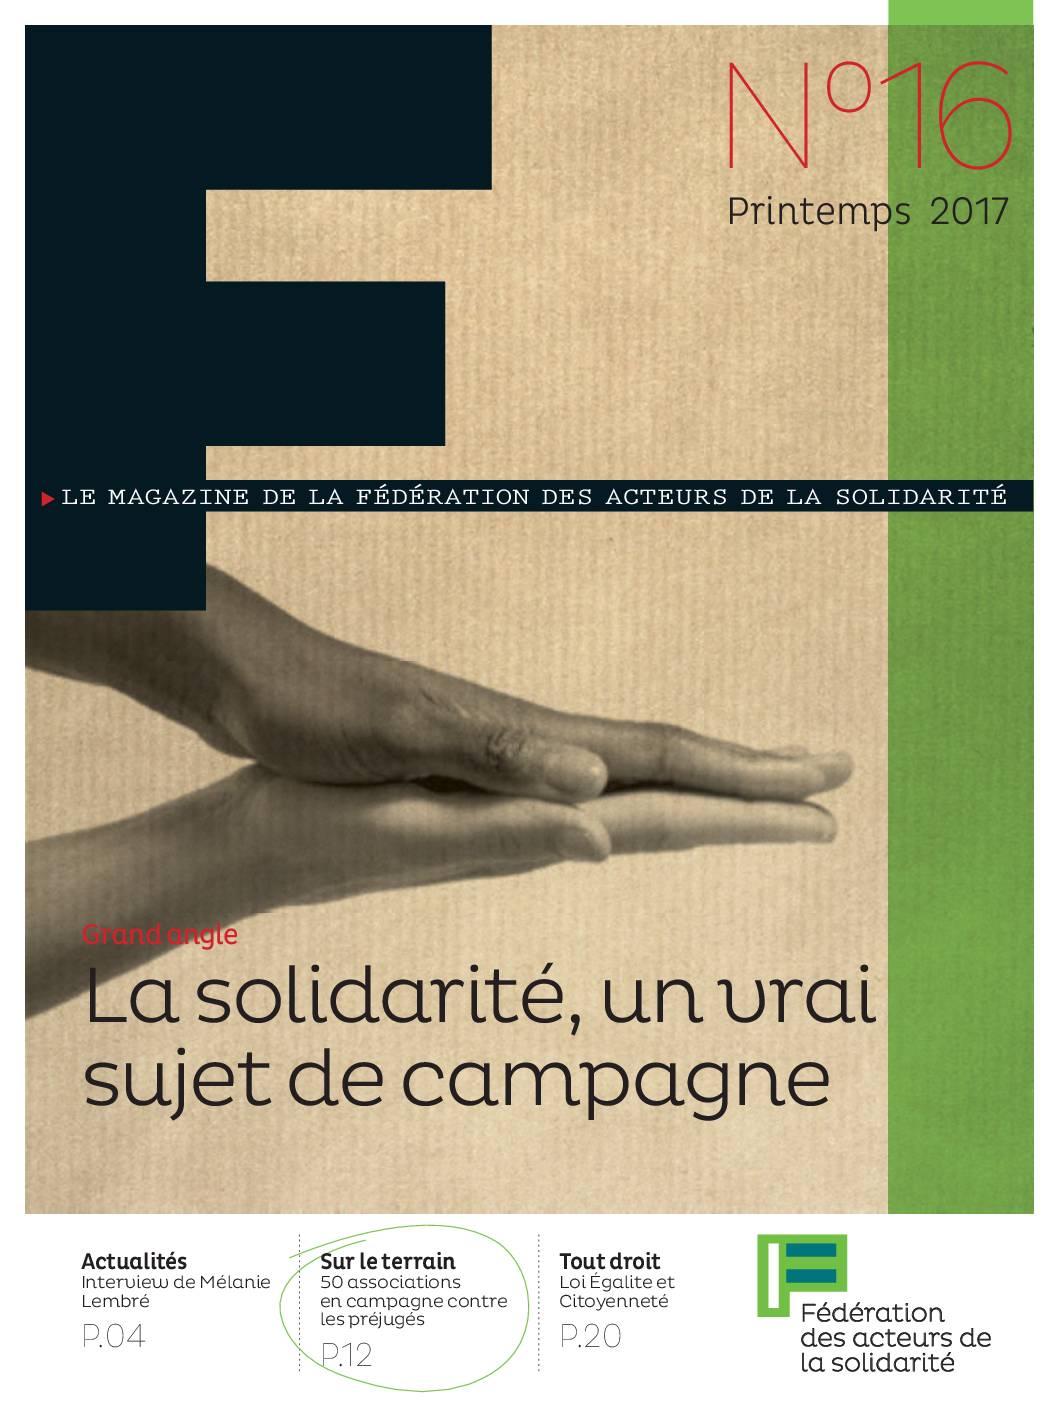 F#16 La solidarité, un vrai sujet de campagne